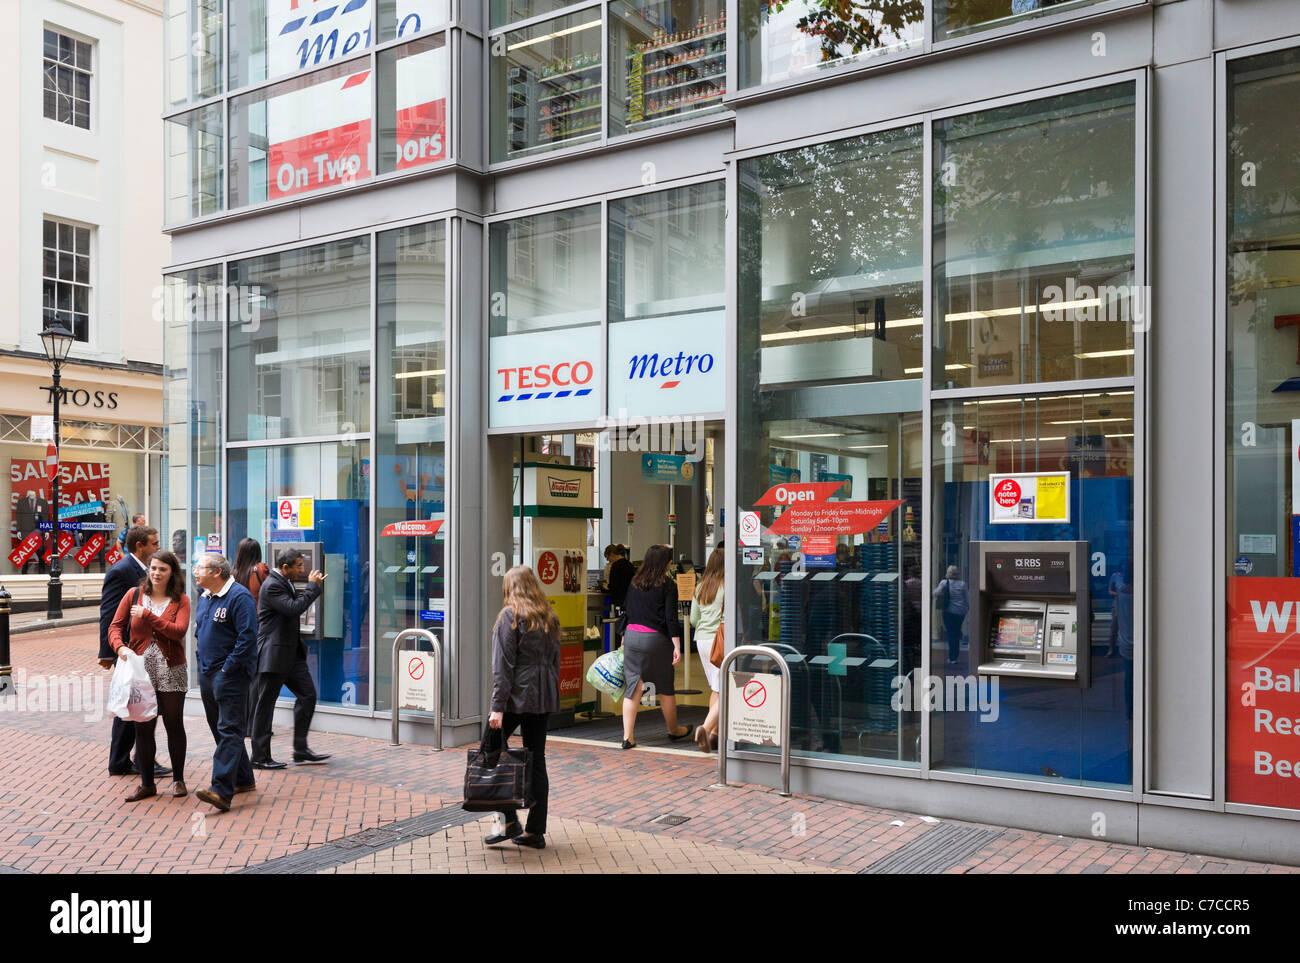 Tesco Metro store on New Street in the city centre, Birmingham, West Midlands, England, UK - Stock Image